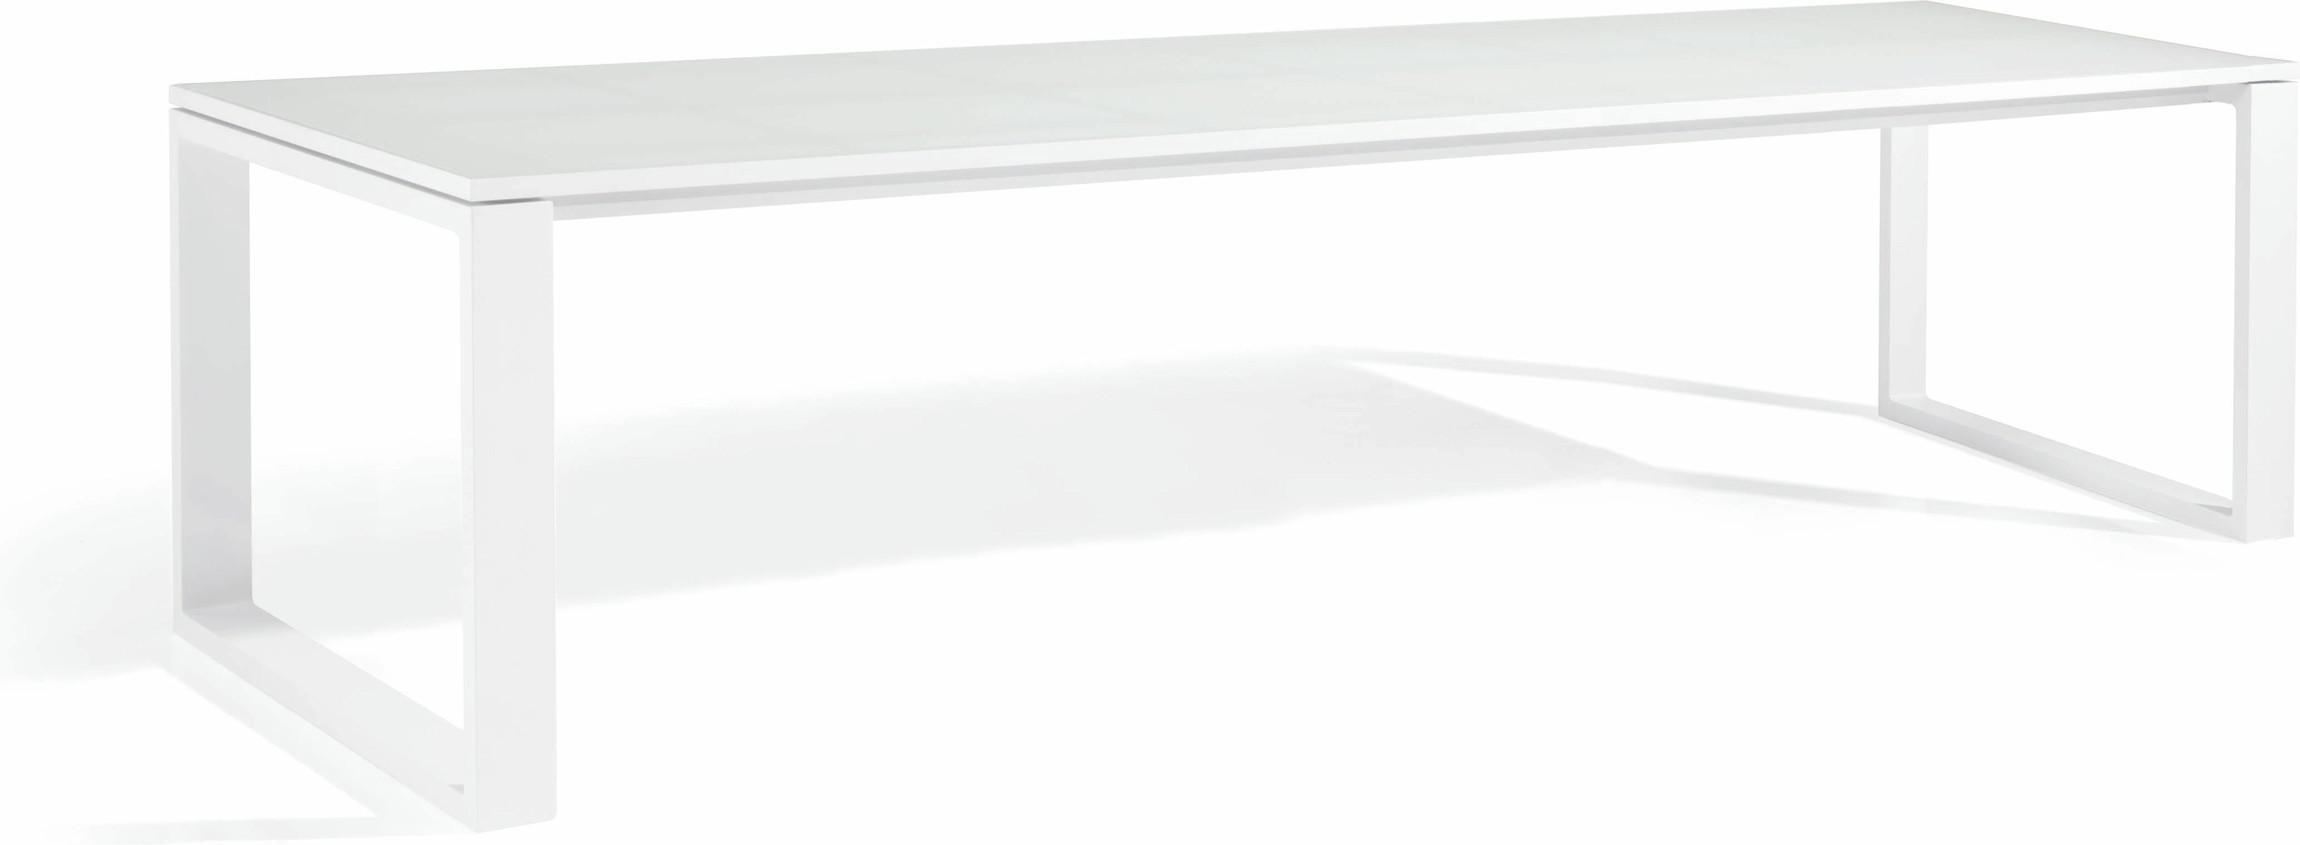 Table à manger Fuse - blanc - GLW 300